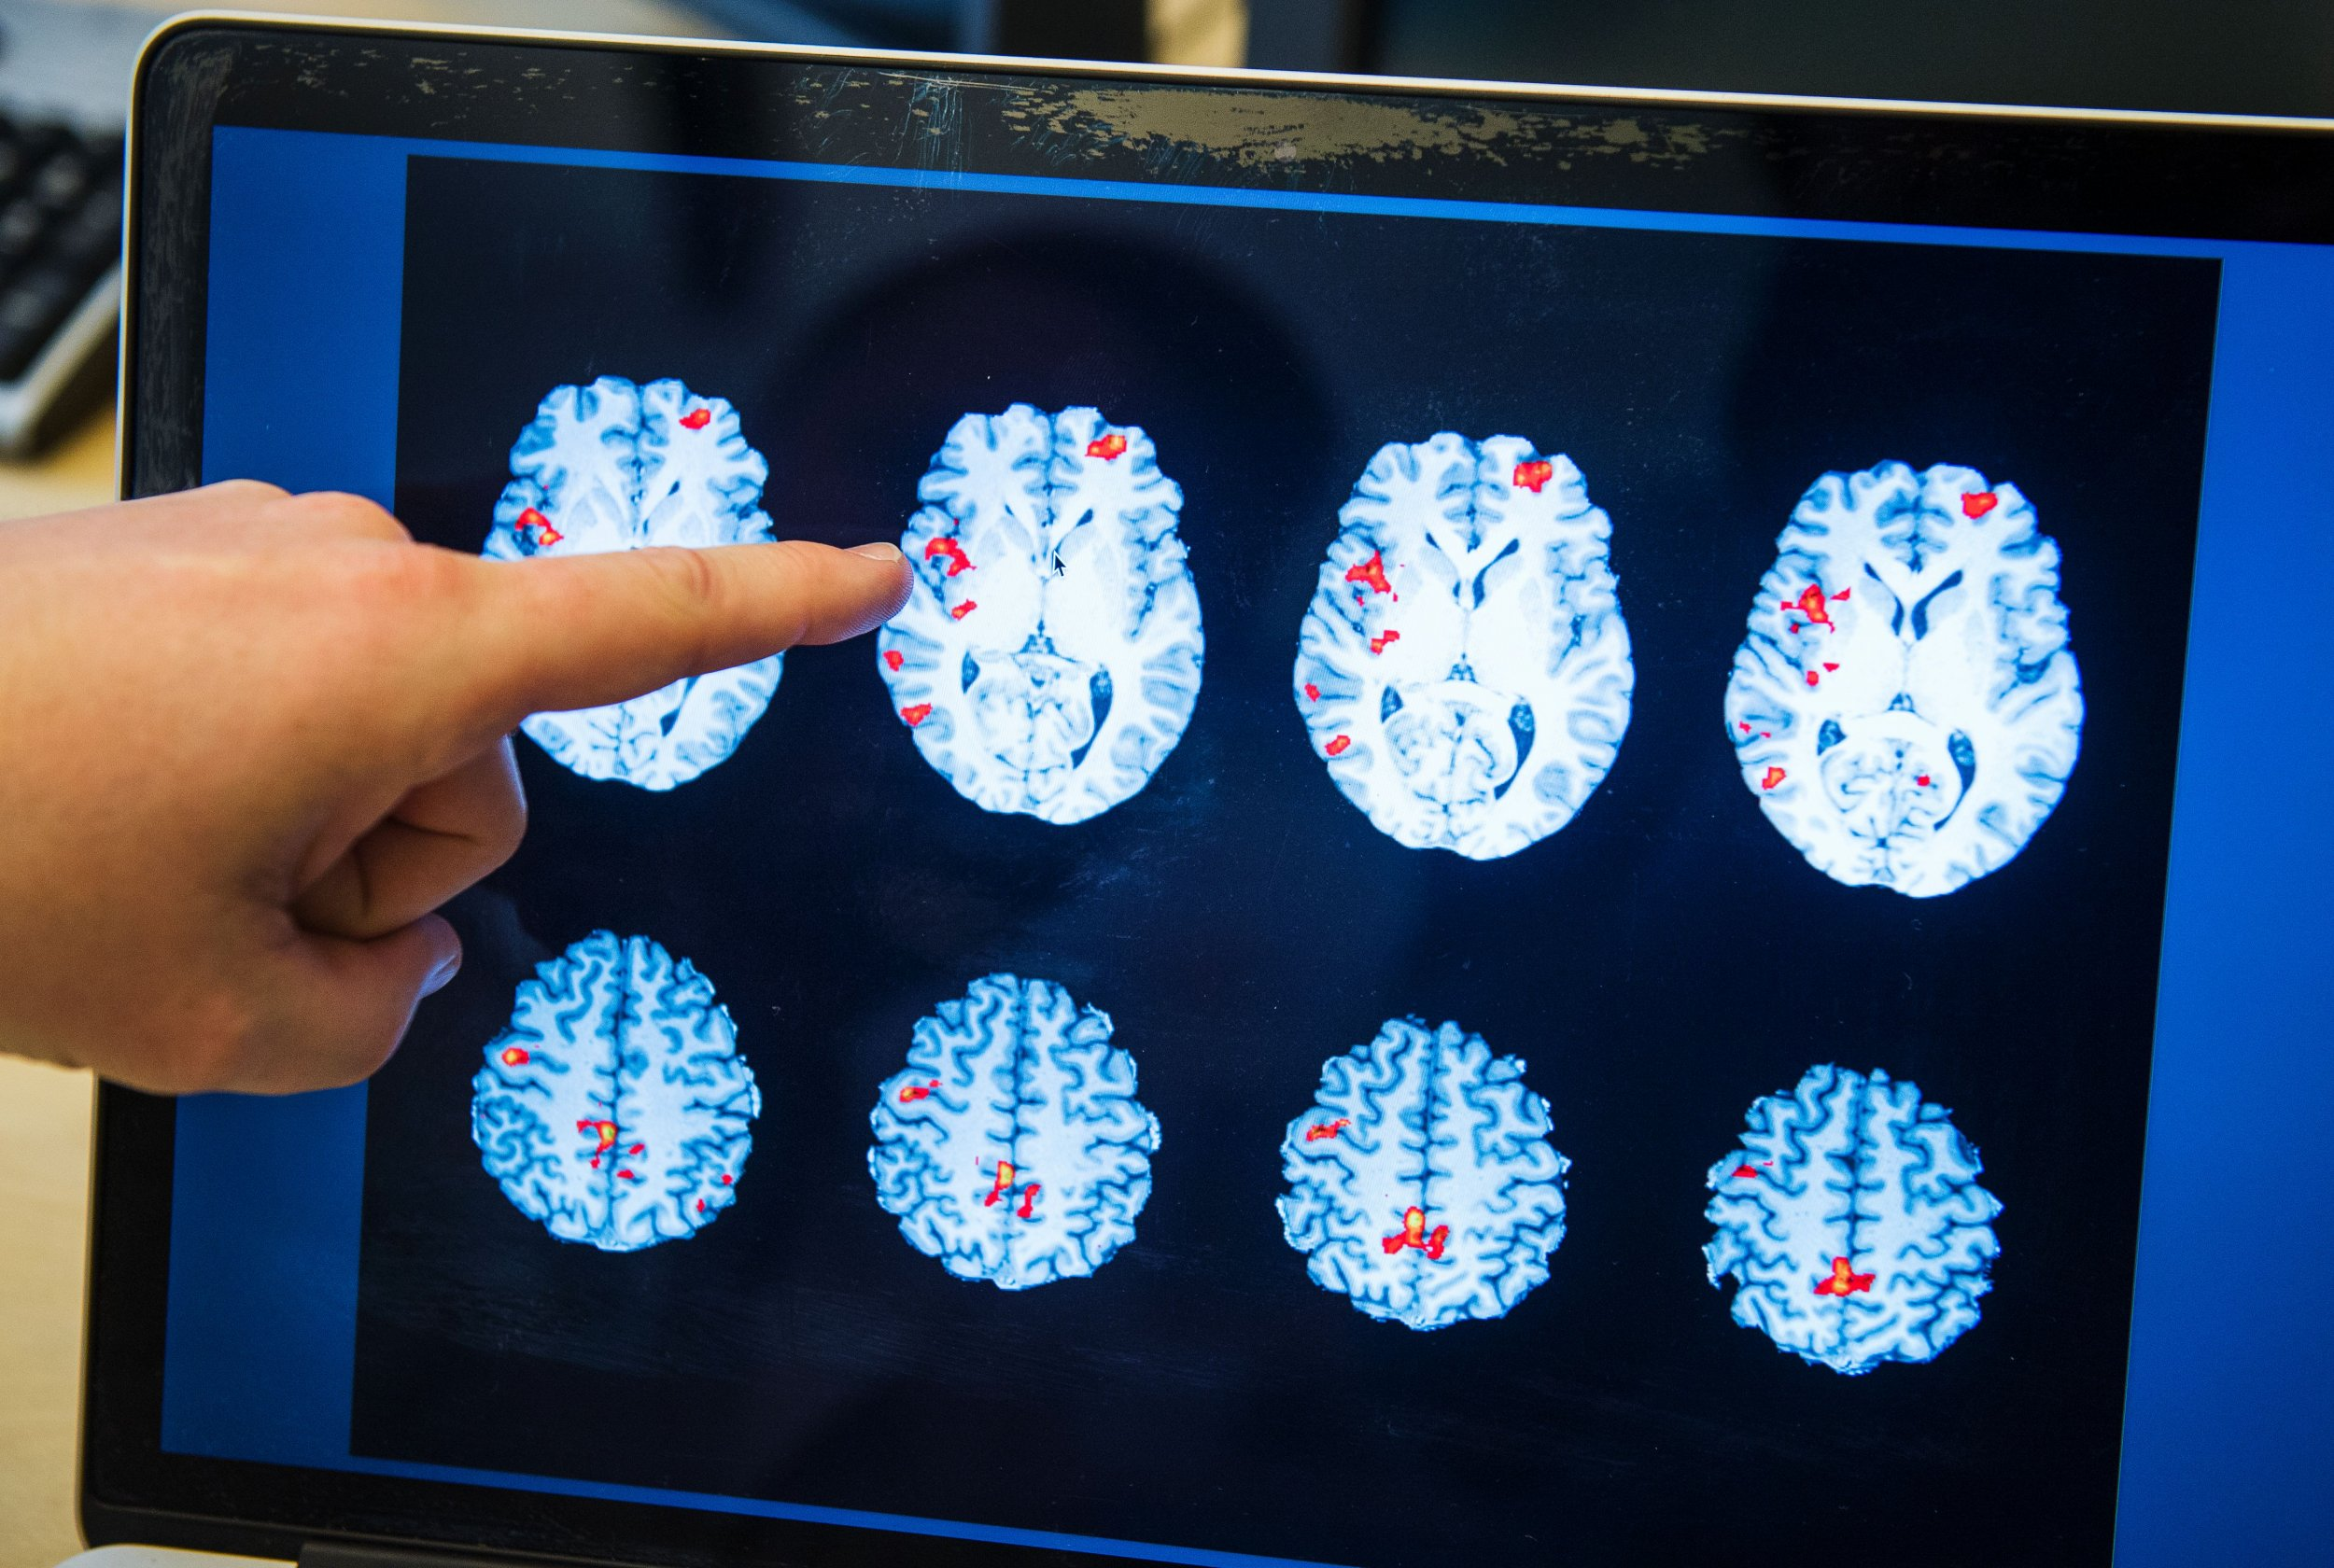 brain scan pedophiles